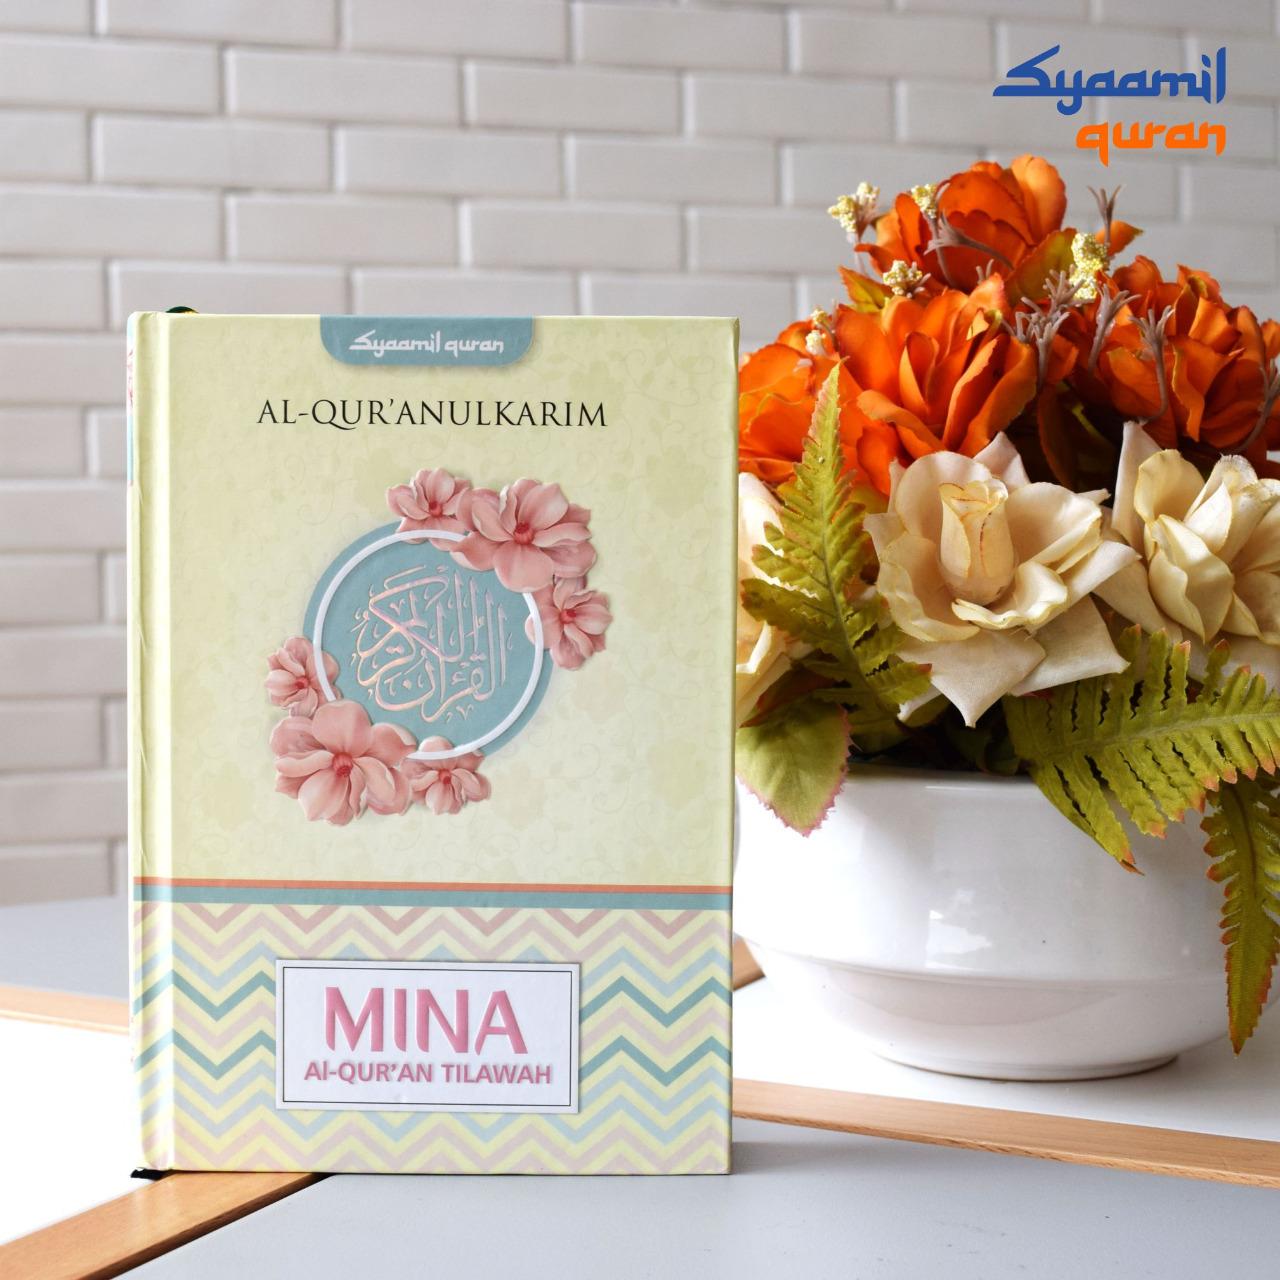 Jual Produk Syaamil Qur'an, Al-Qur'an Mina Tilawah: Al-Qur'an Khusus Wanita